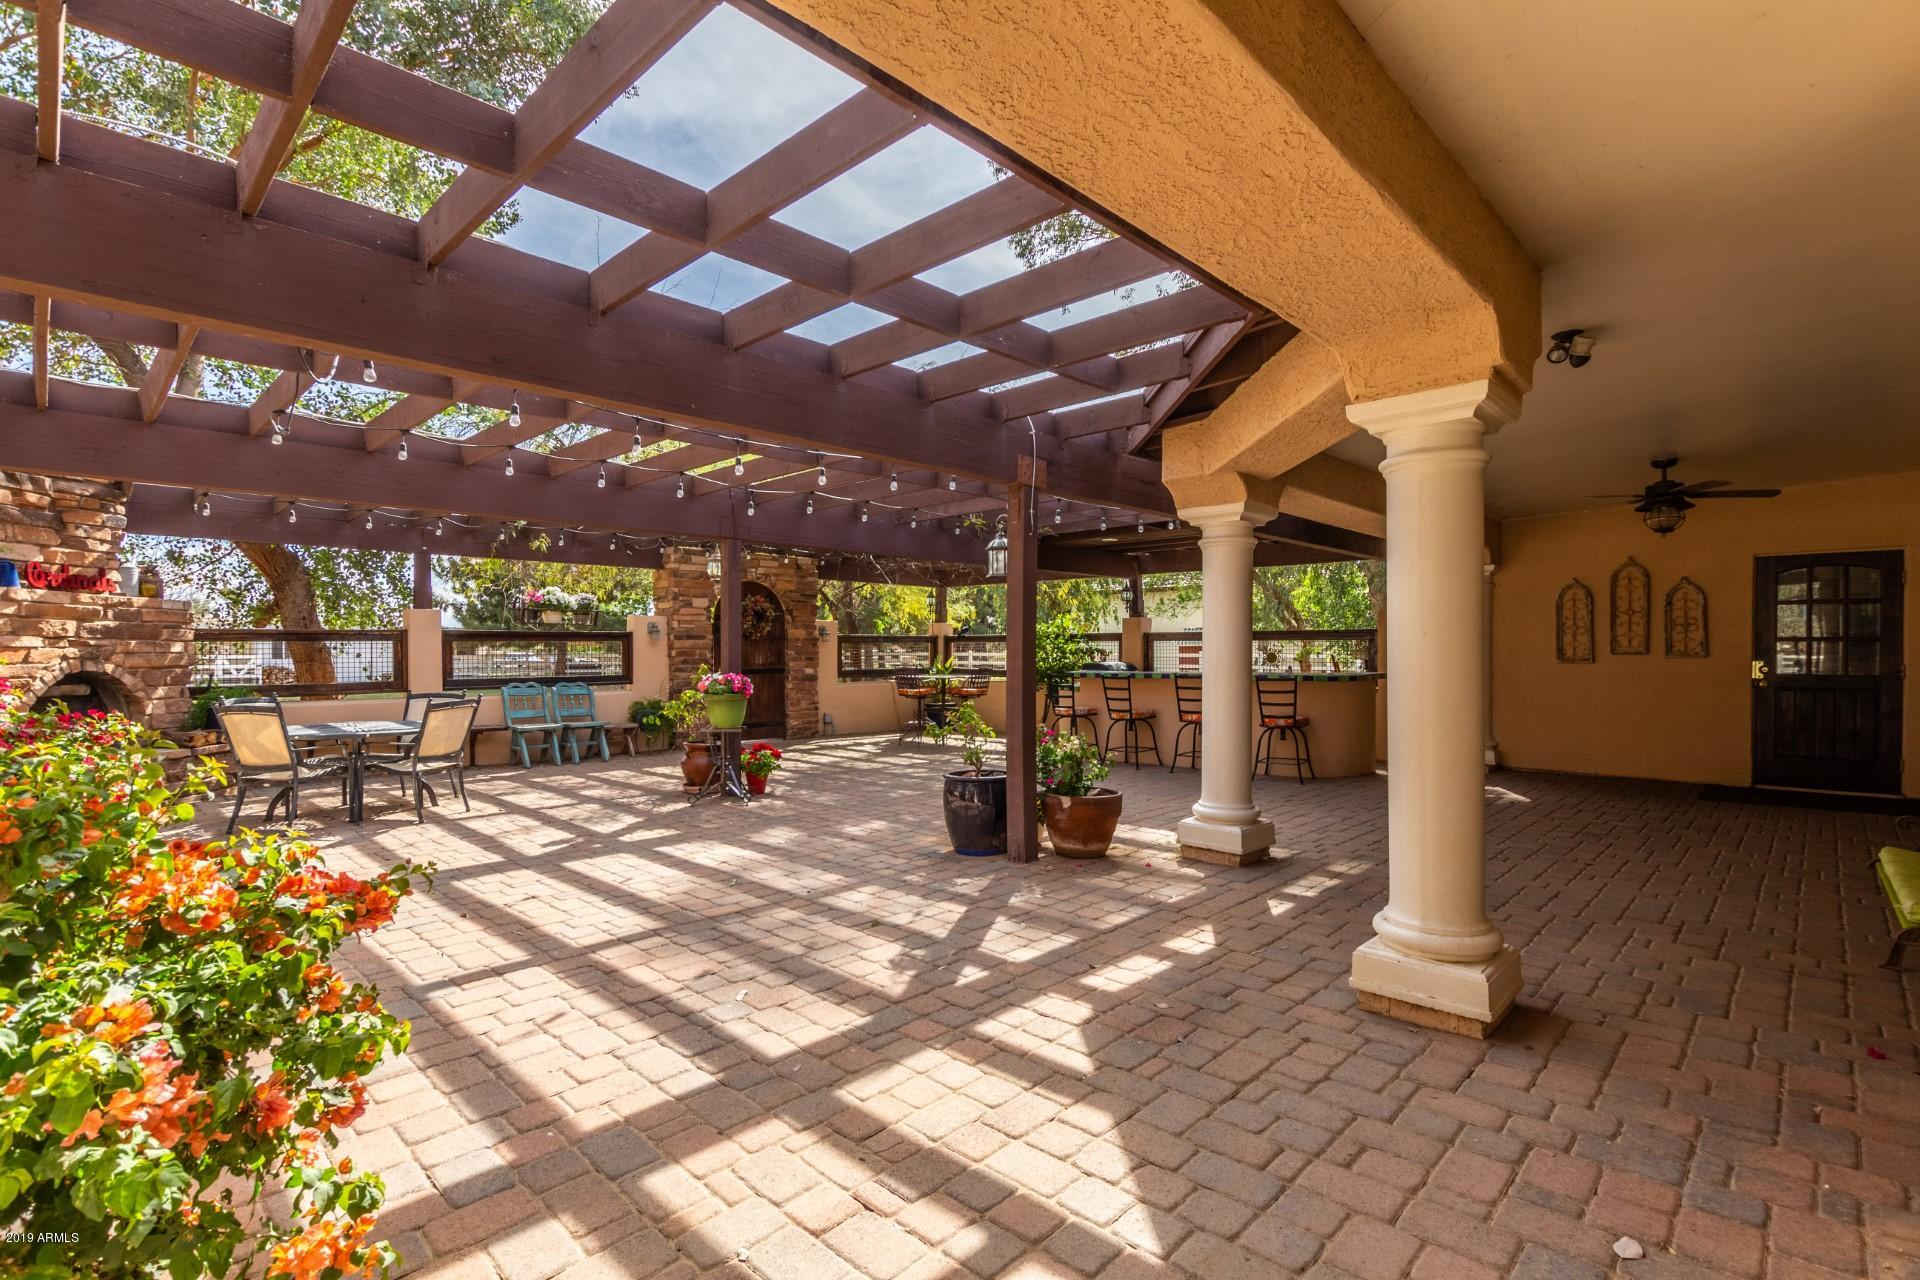 Litchfield Park AZ 85340 Photo 27